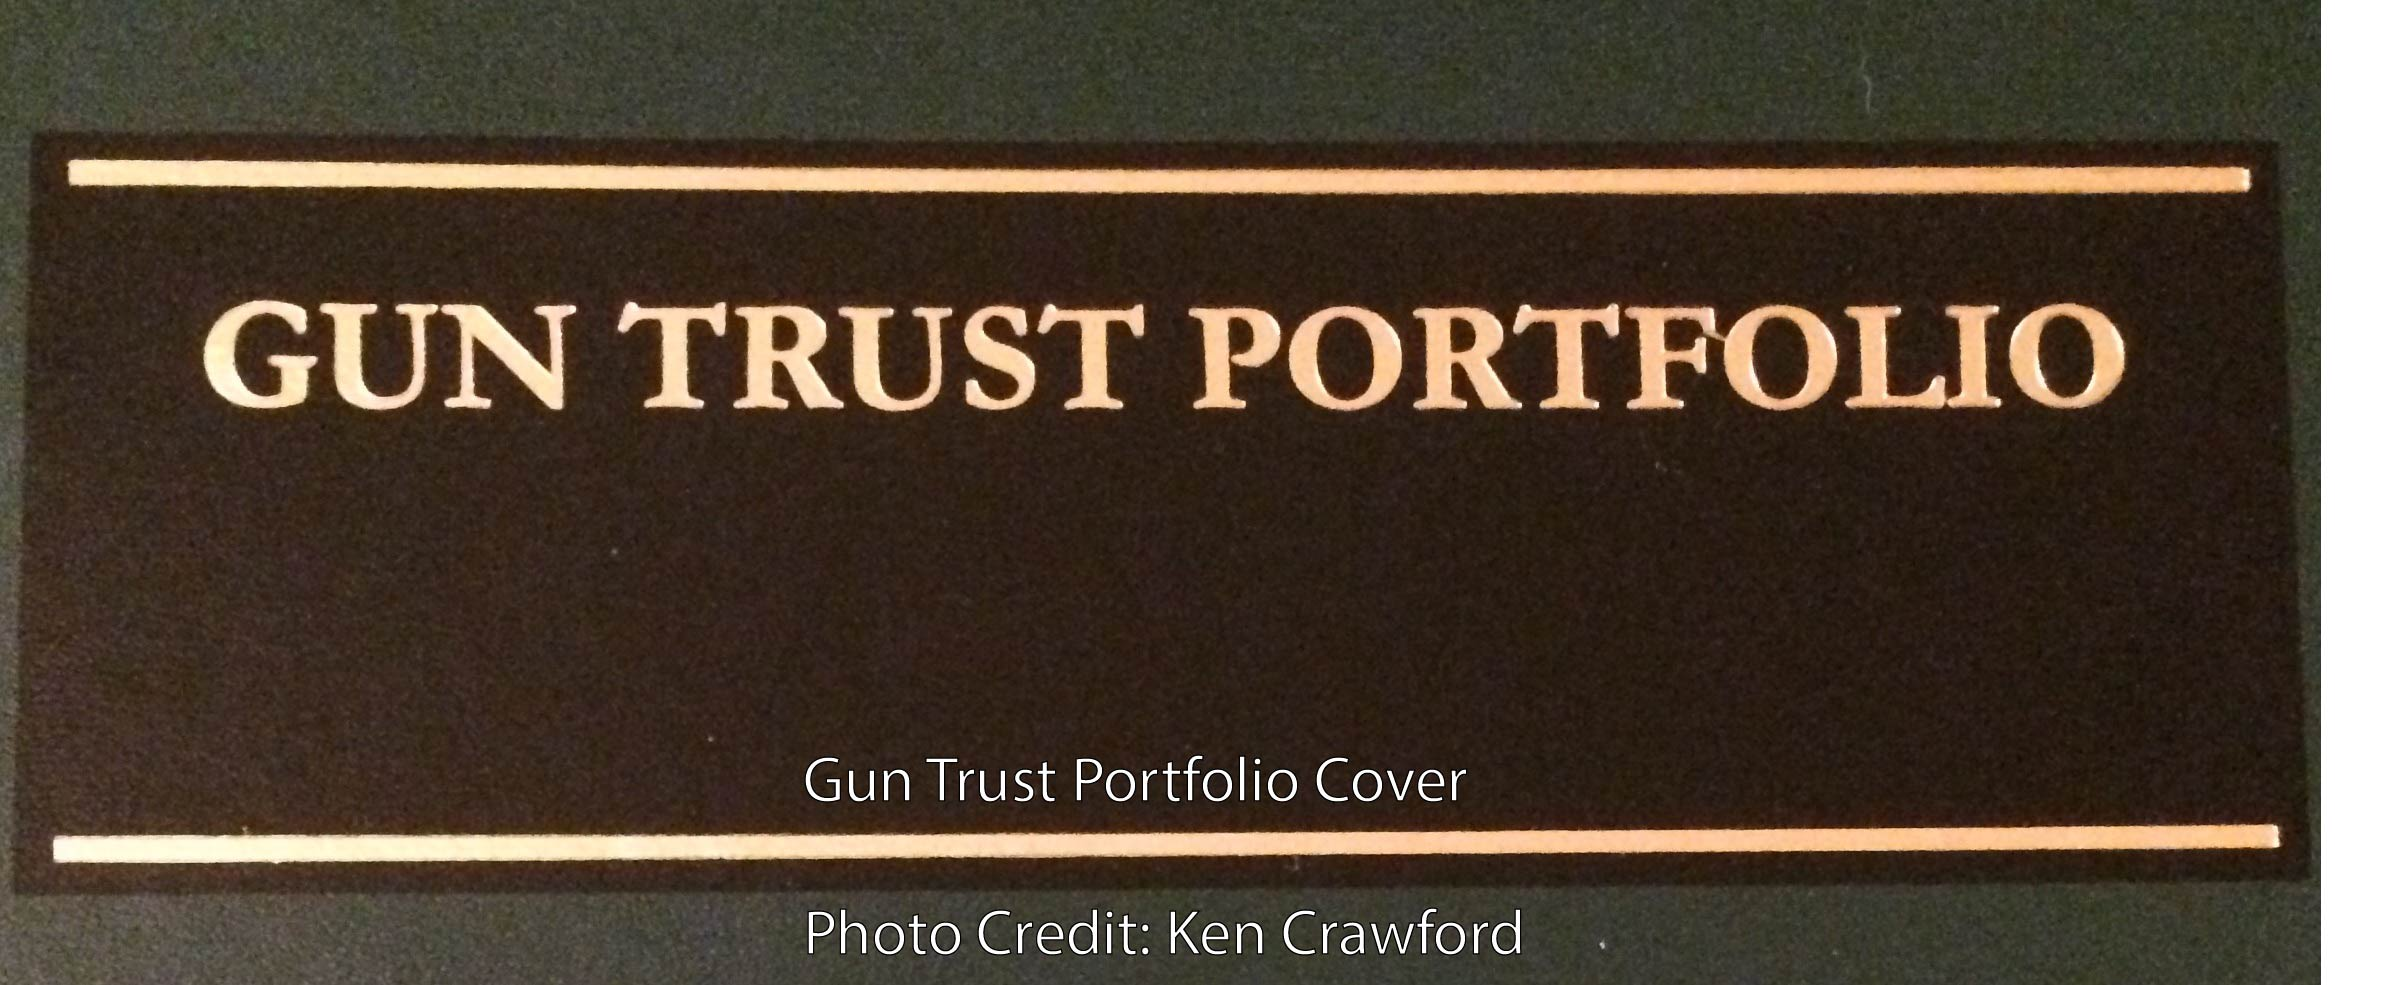 Gun Trust Portfoliol